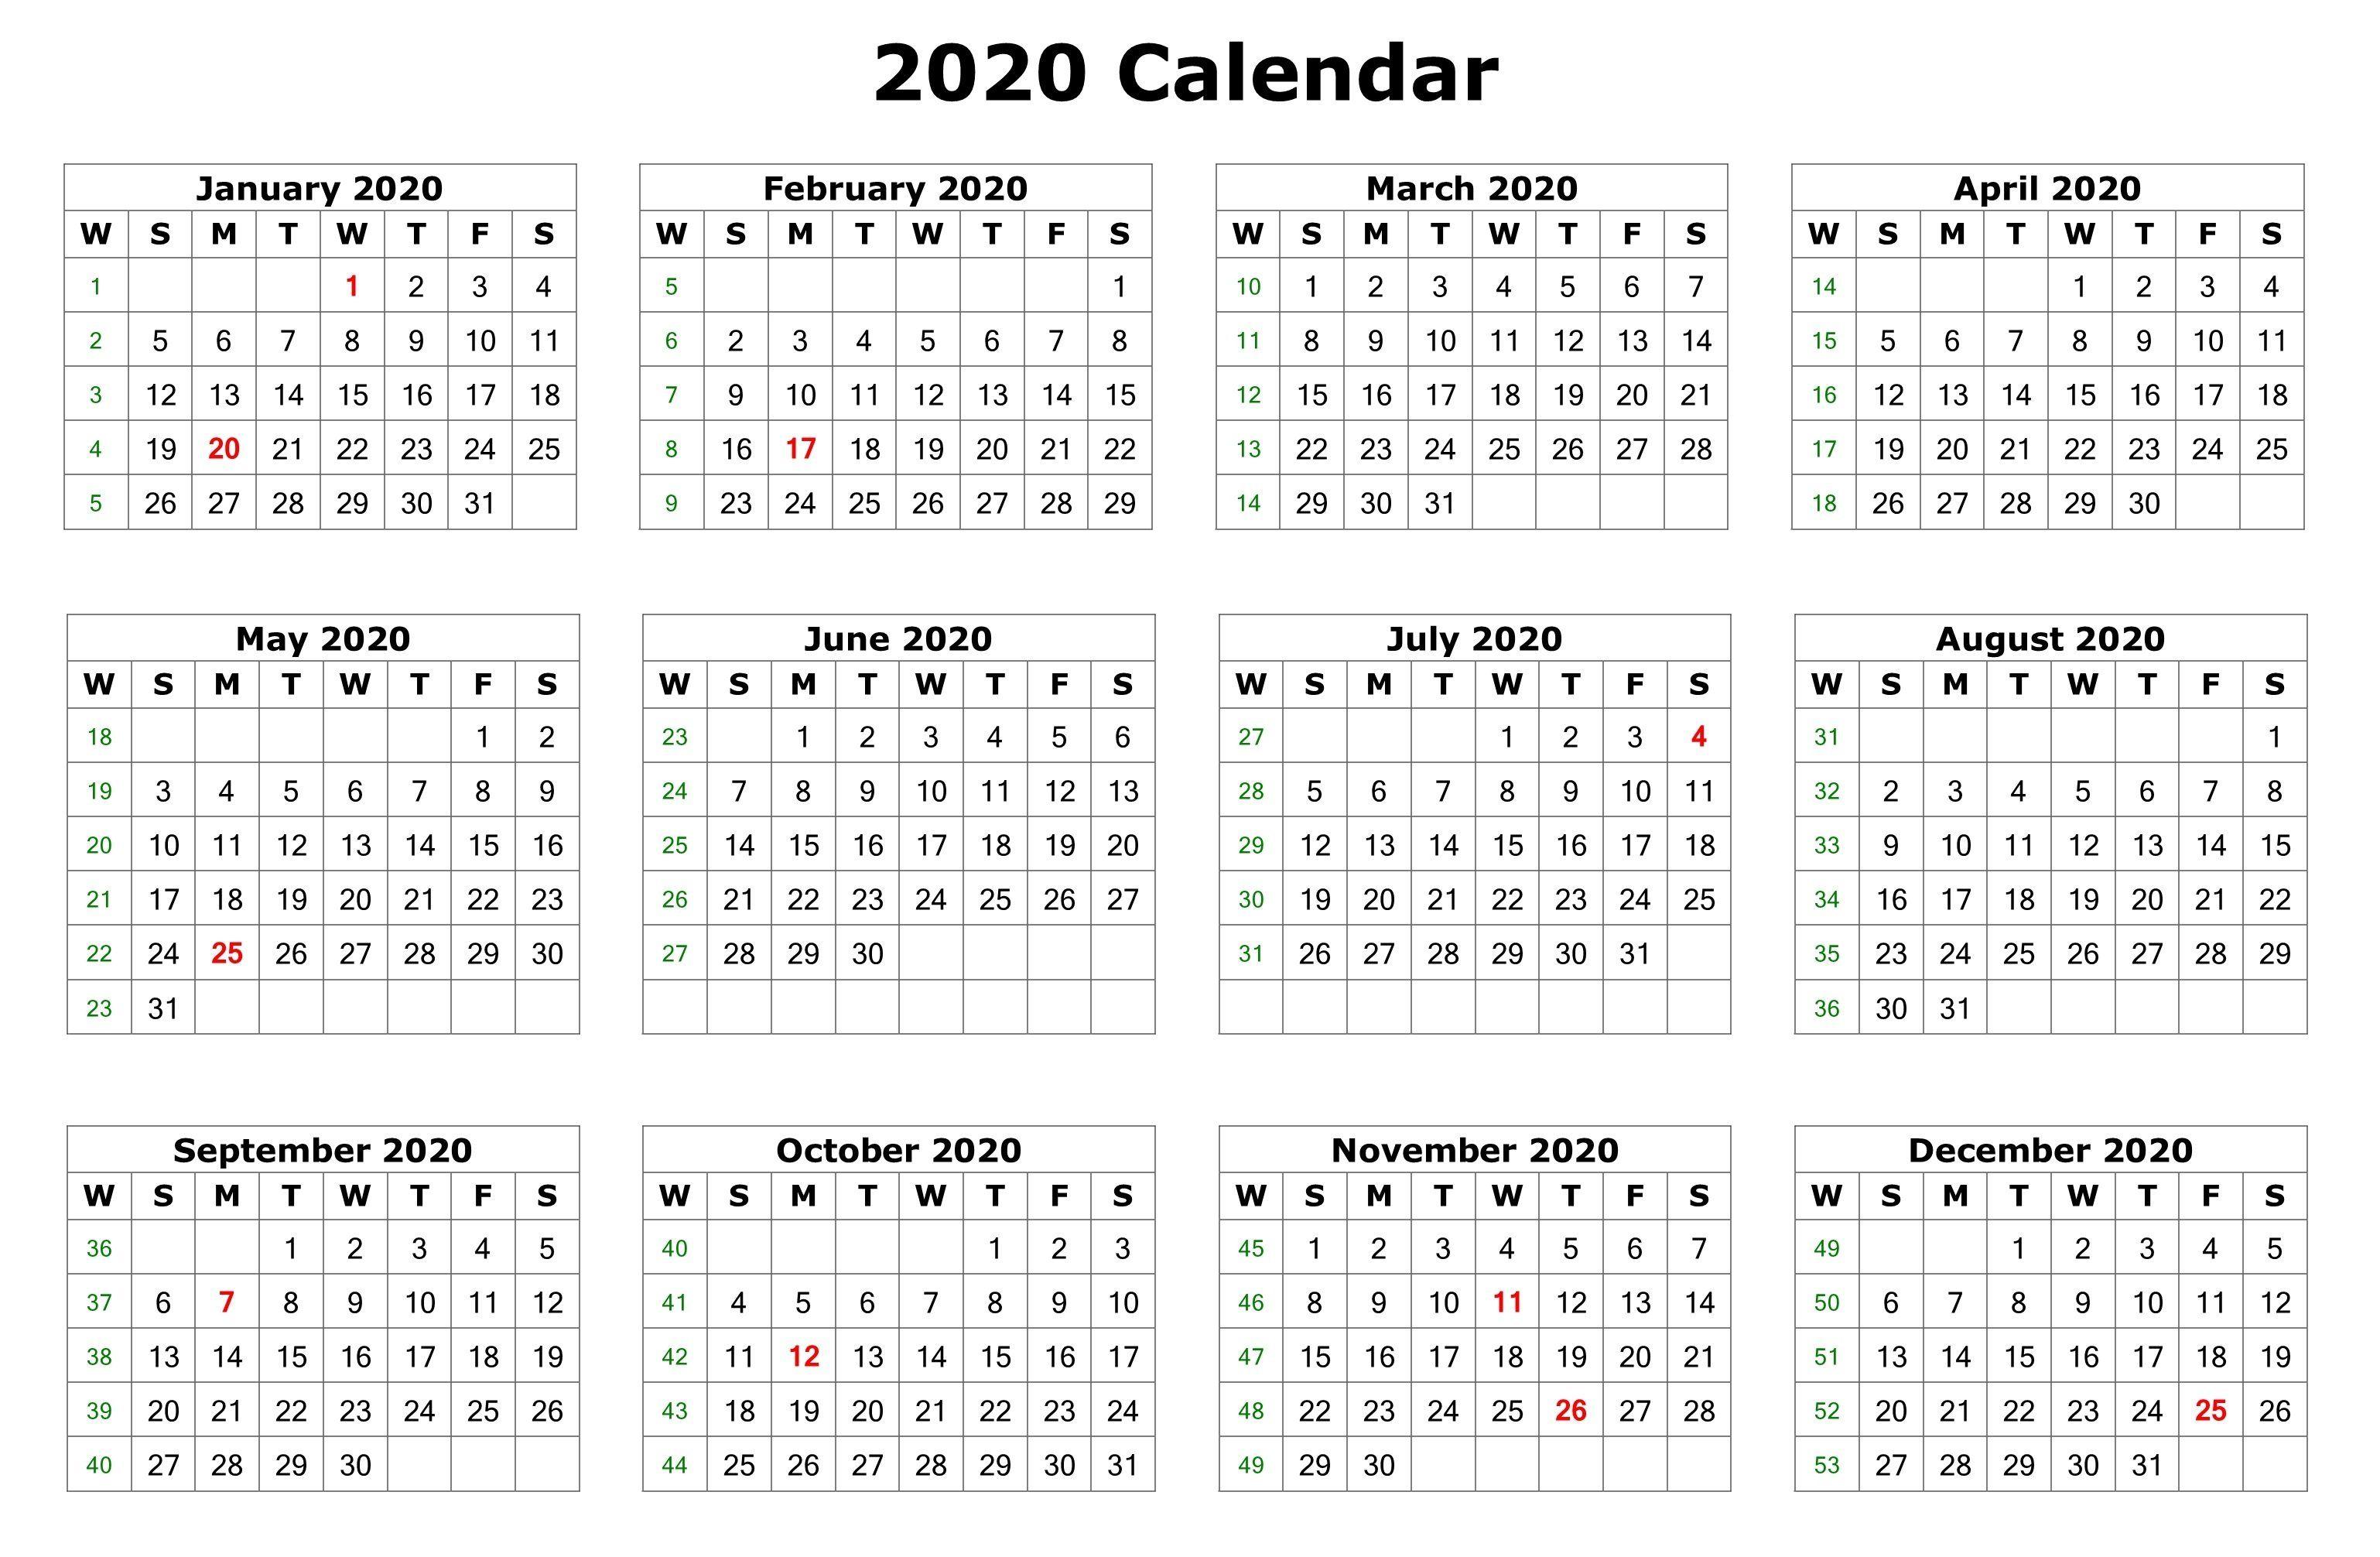 Blank 2020 Calendars - Wpa.wpart.co